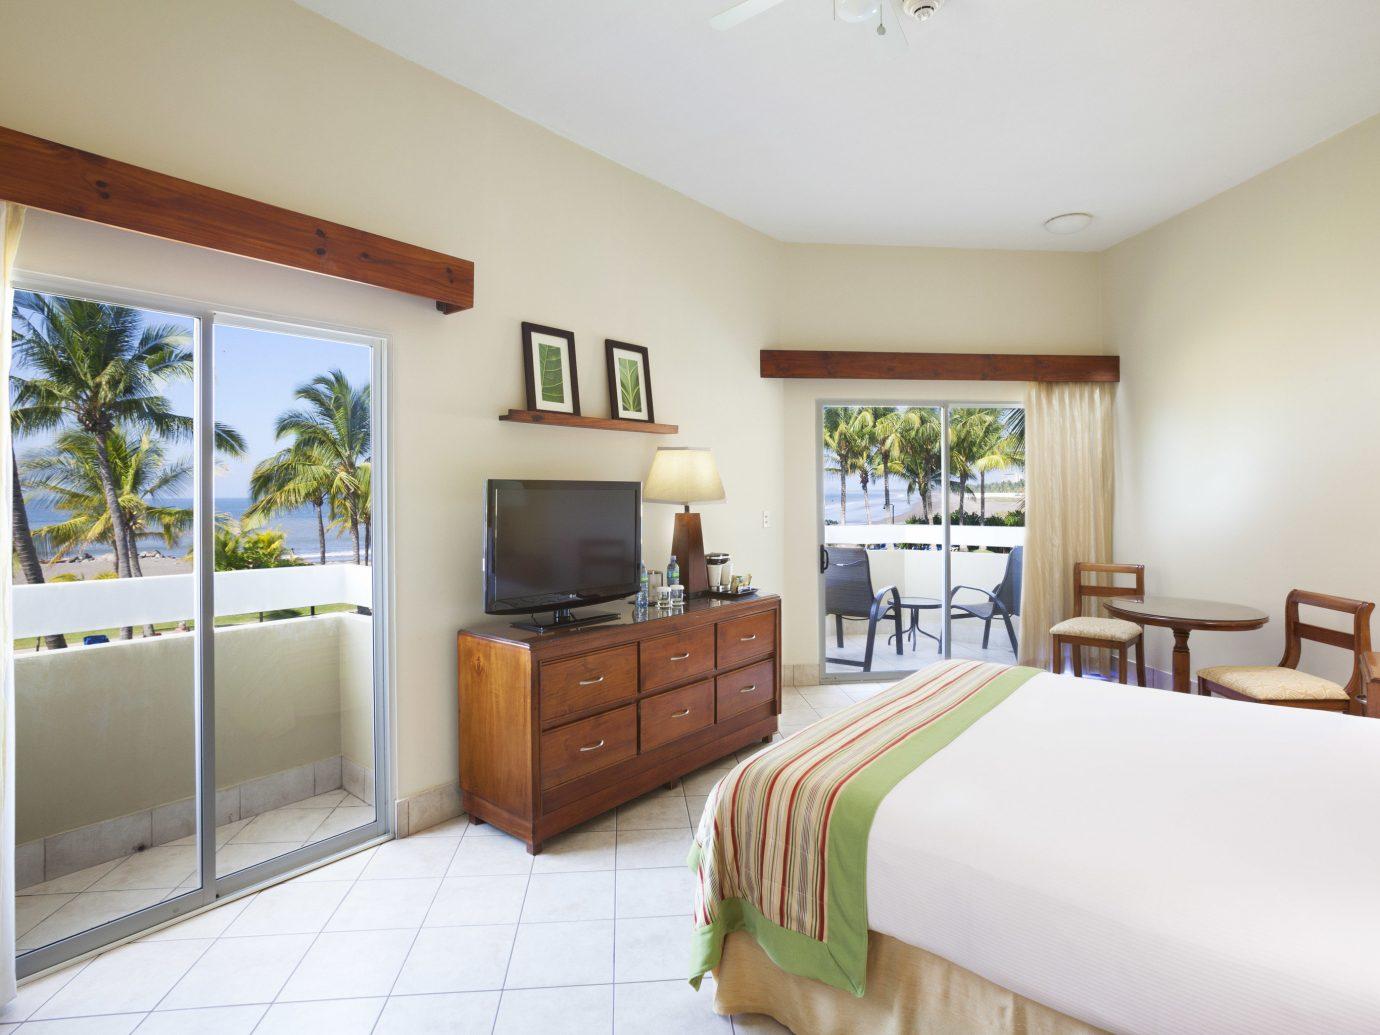 A guest bedroom at Fiesta Resort All Inclusive Costa Rica